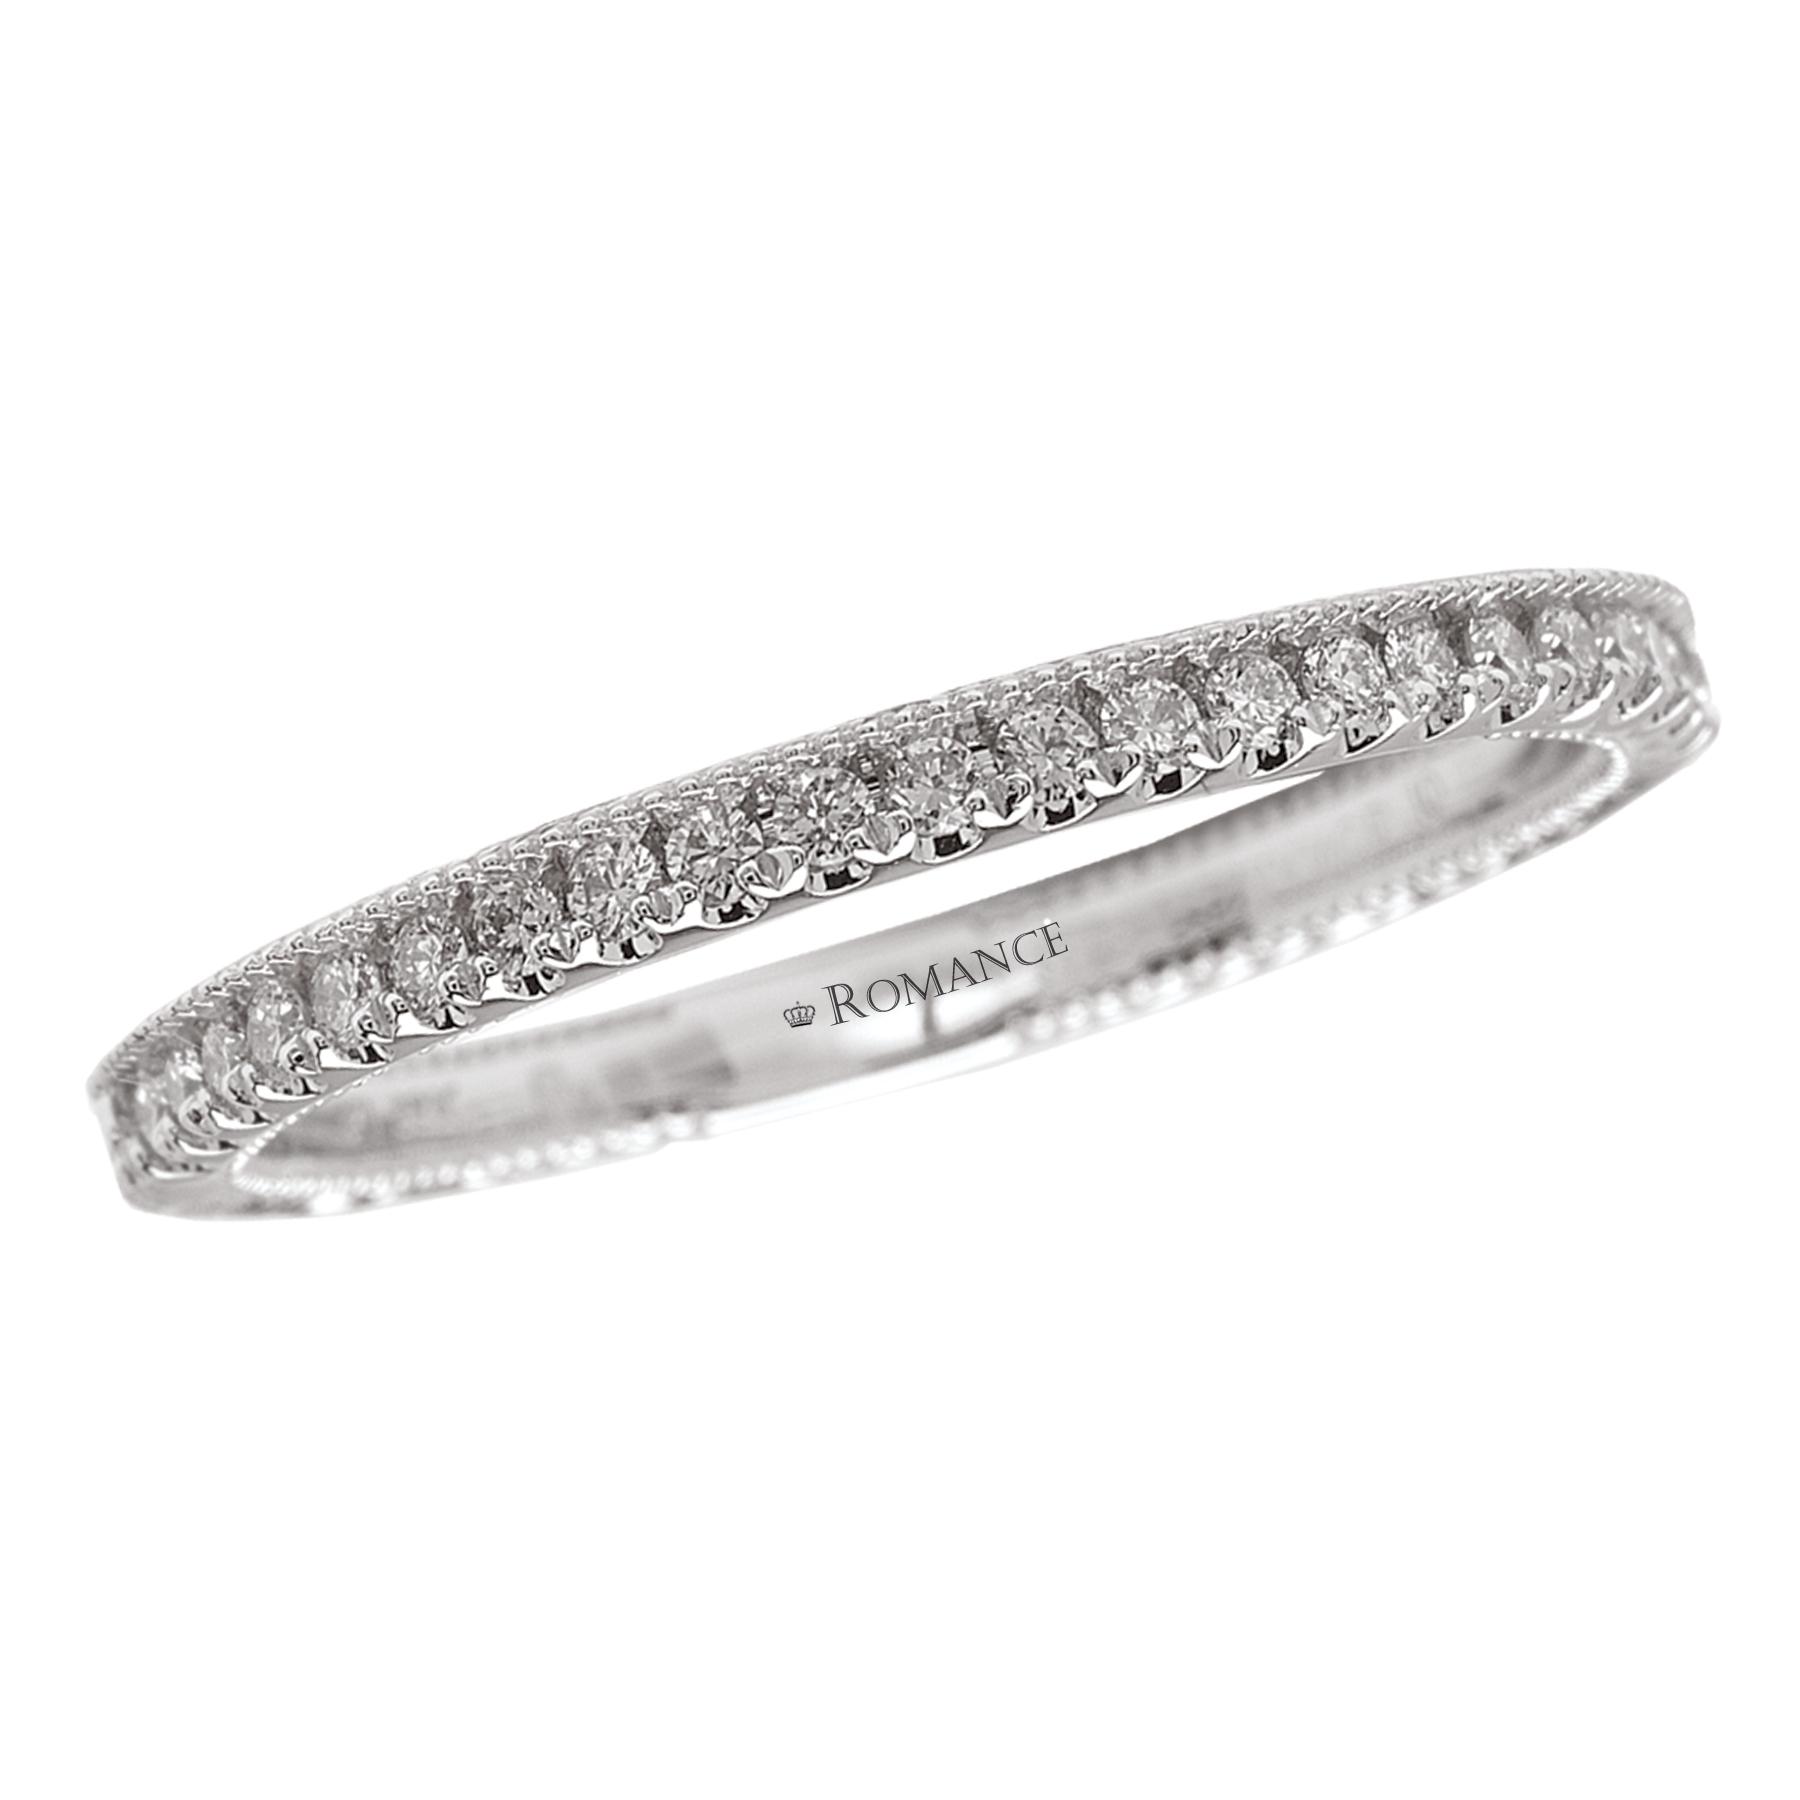 Romance Wedding Bands 118188-W product image